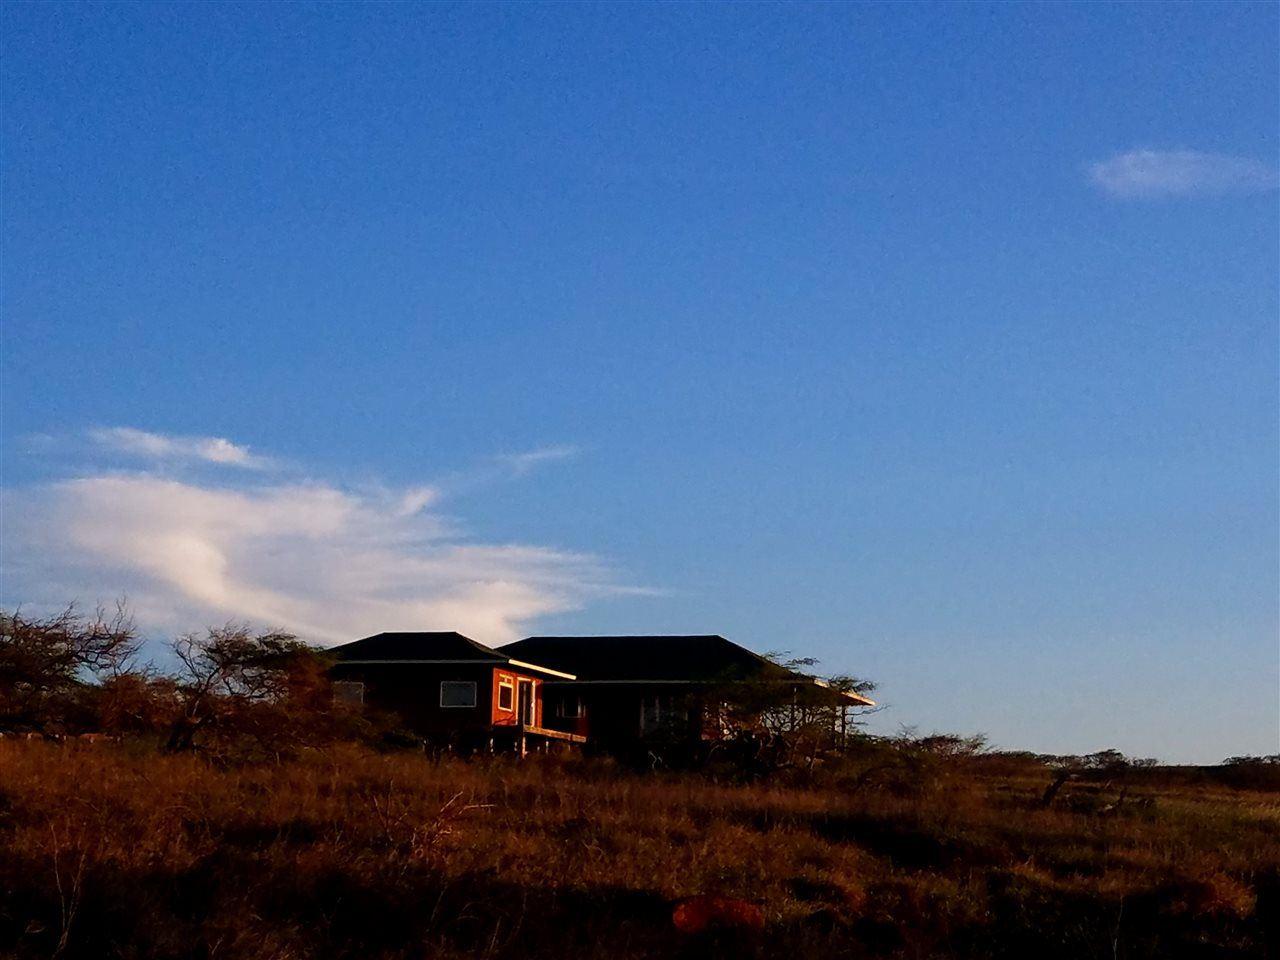 Photo of 308 Ahiu Rd, Maunaloa, HI 96770-0000 (MLS # 391748)